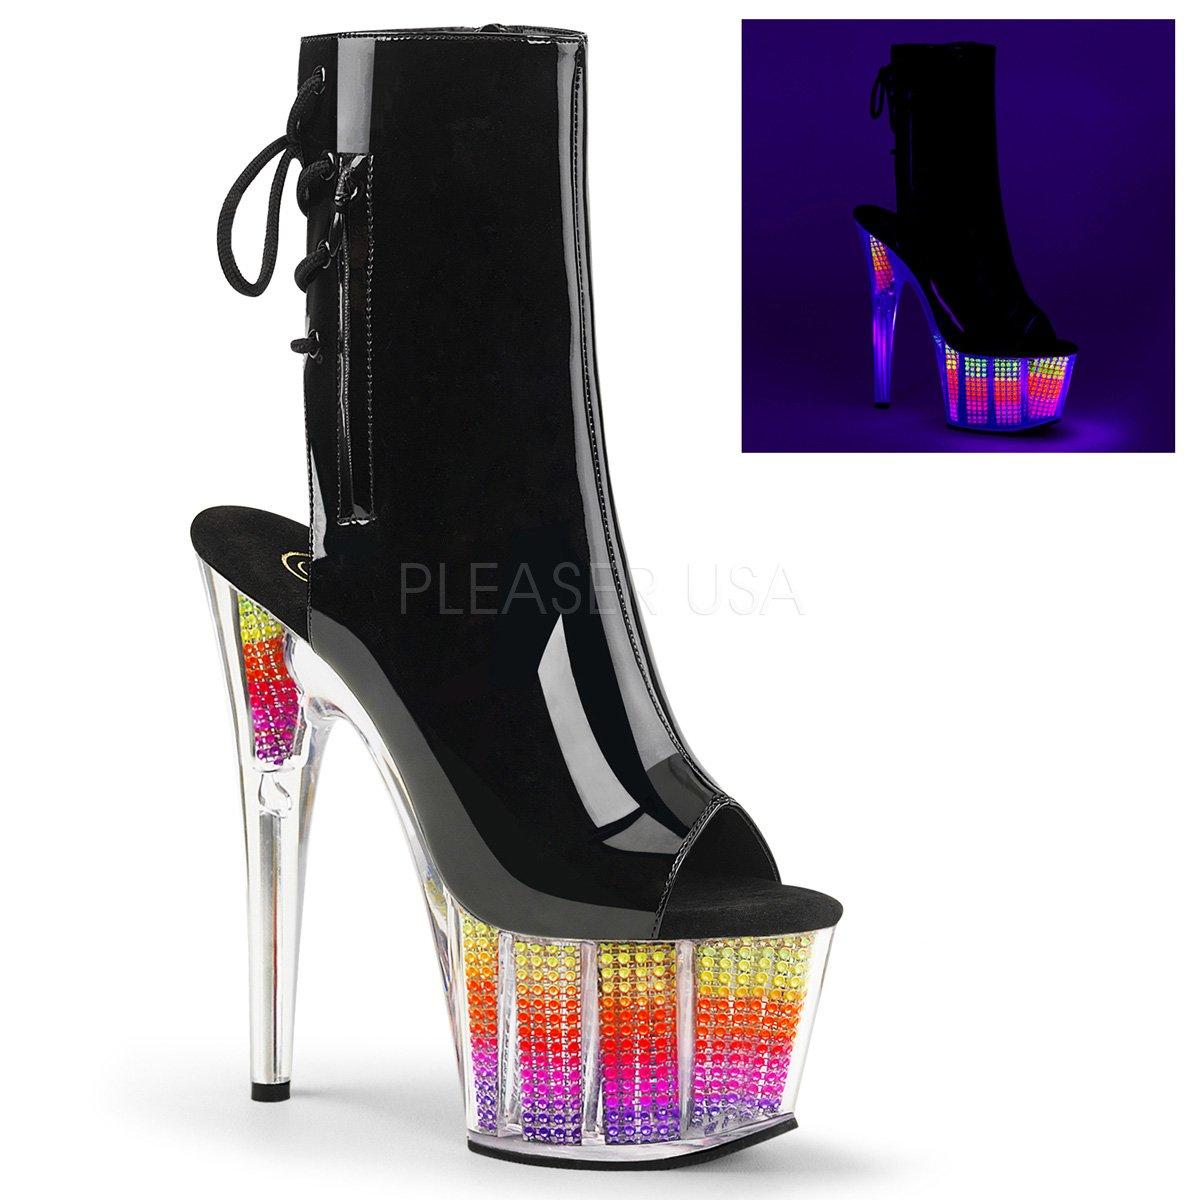 Pleaser Women's Ado1018srs/Bpu/Nmc Ankle Bootie B01MUEGZ24 9 B(M) US|Blk Pat/Neon Multi Srs